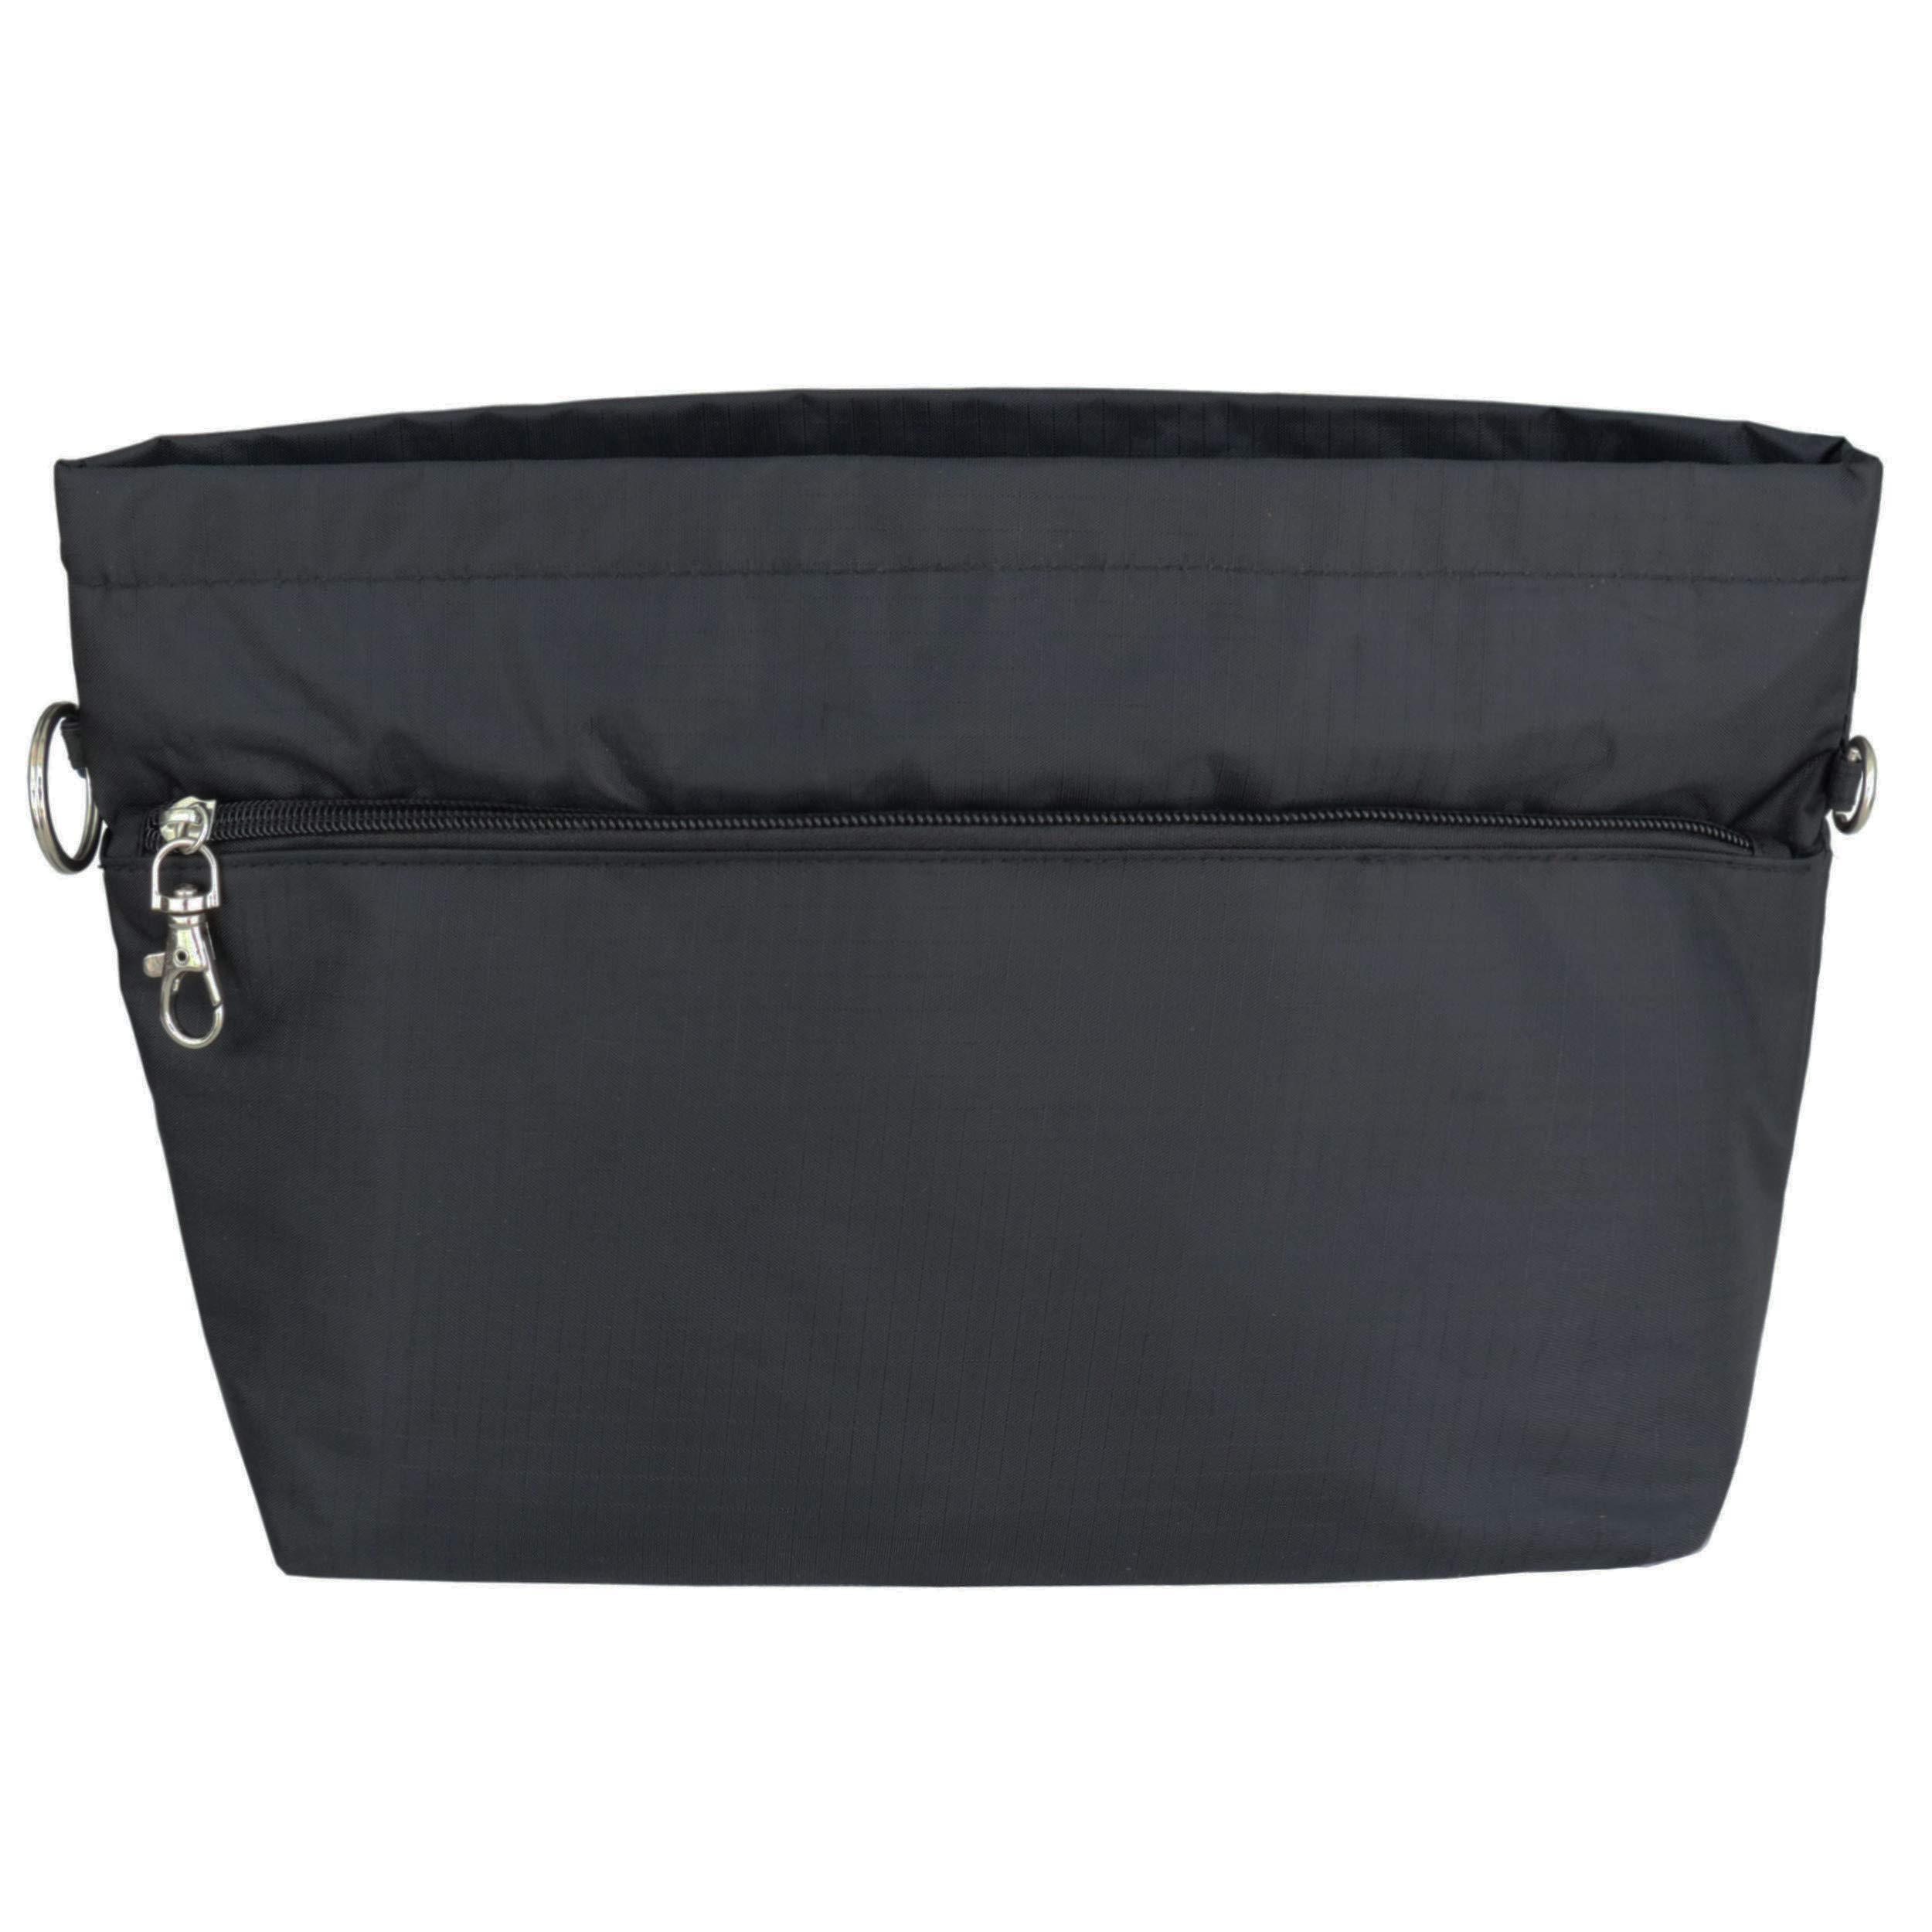 HyFanStr Handbag Organizer Insert Tote Zipper Clousure,Bag in Bag Fit Neverfull GM Black XL